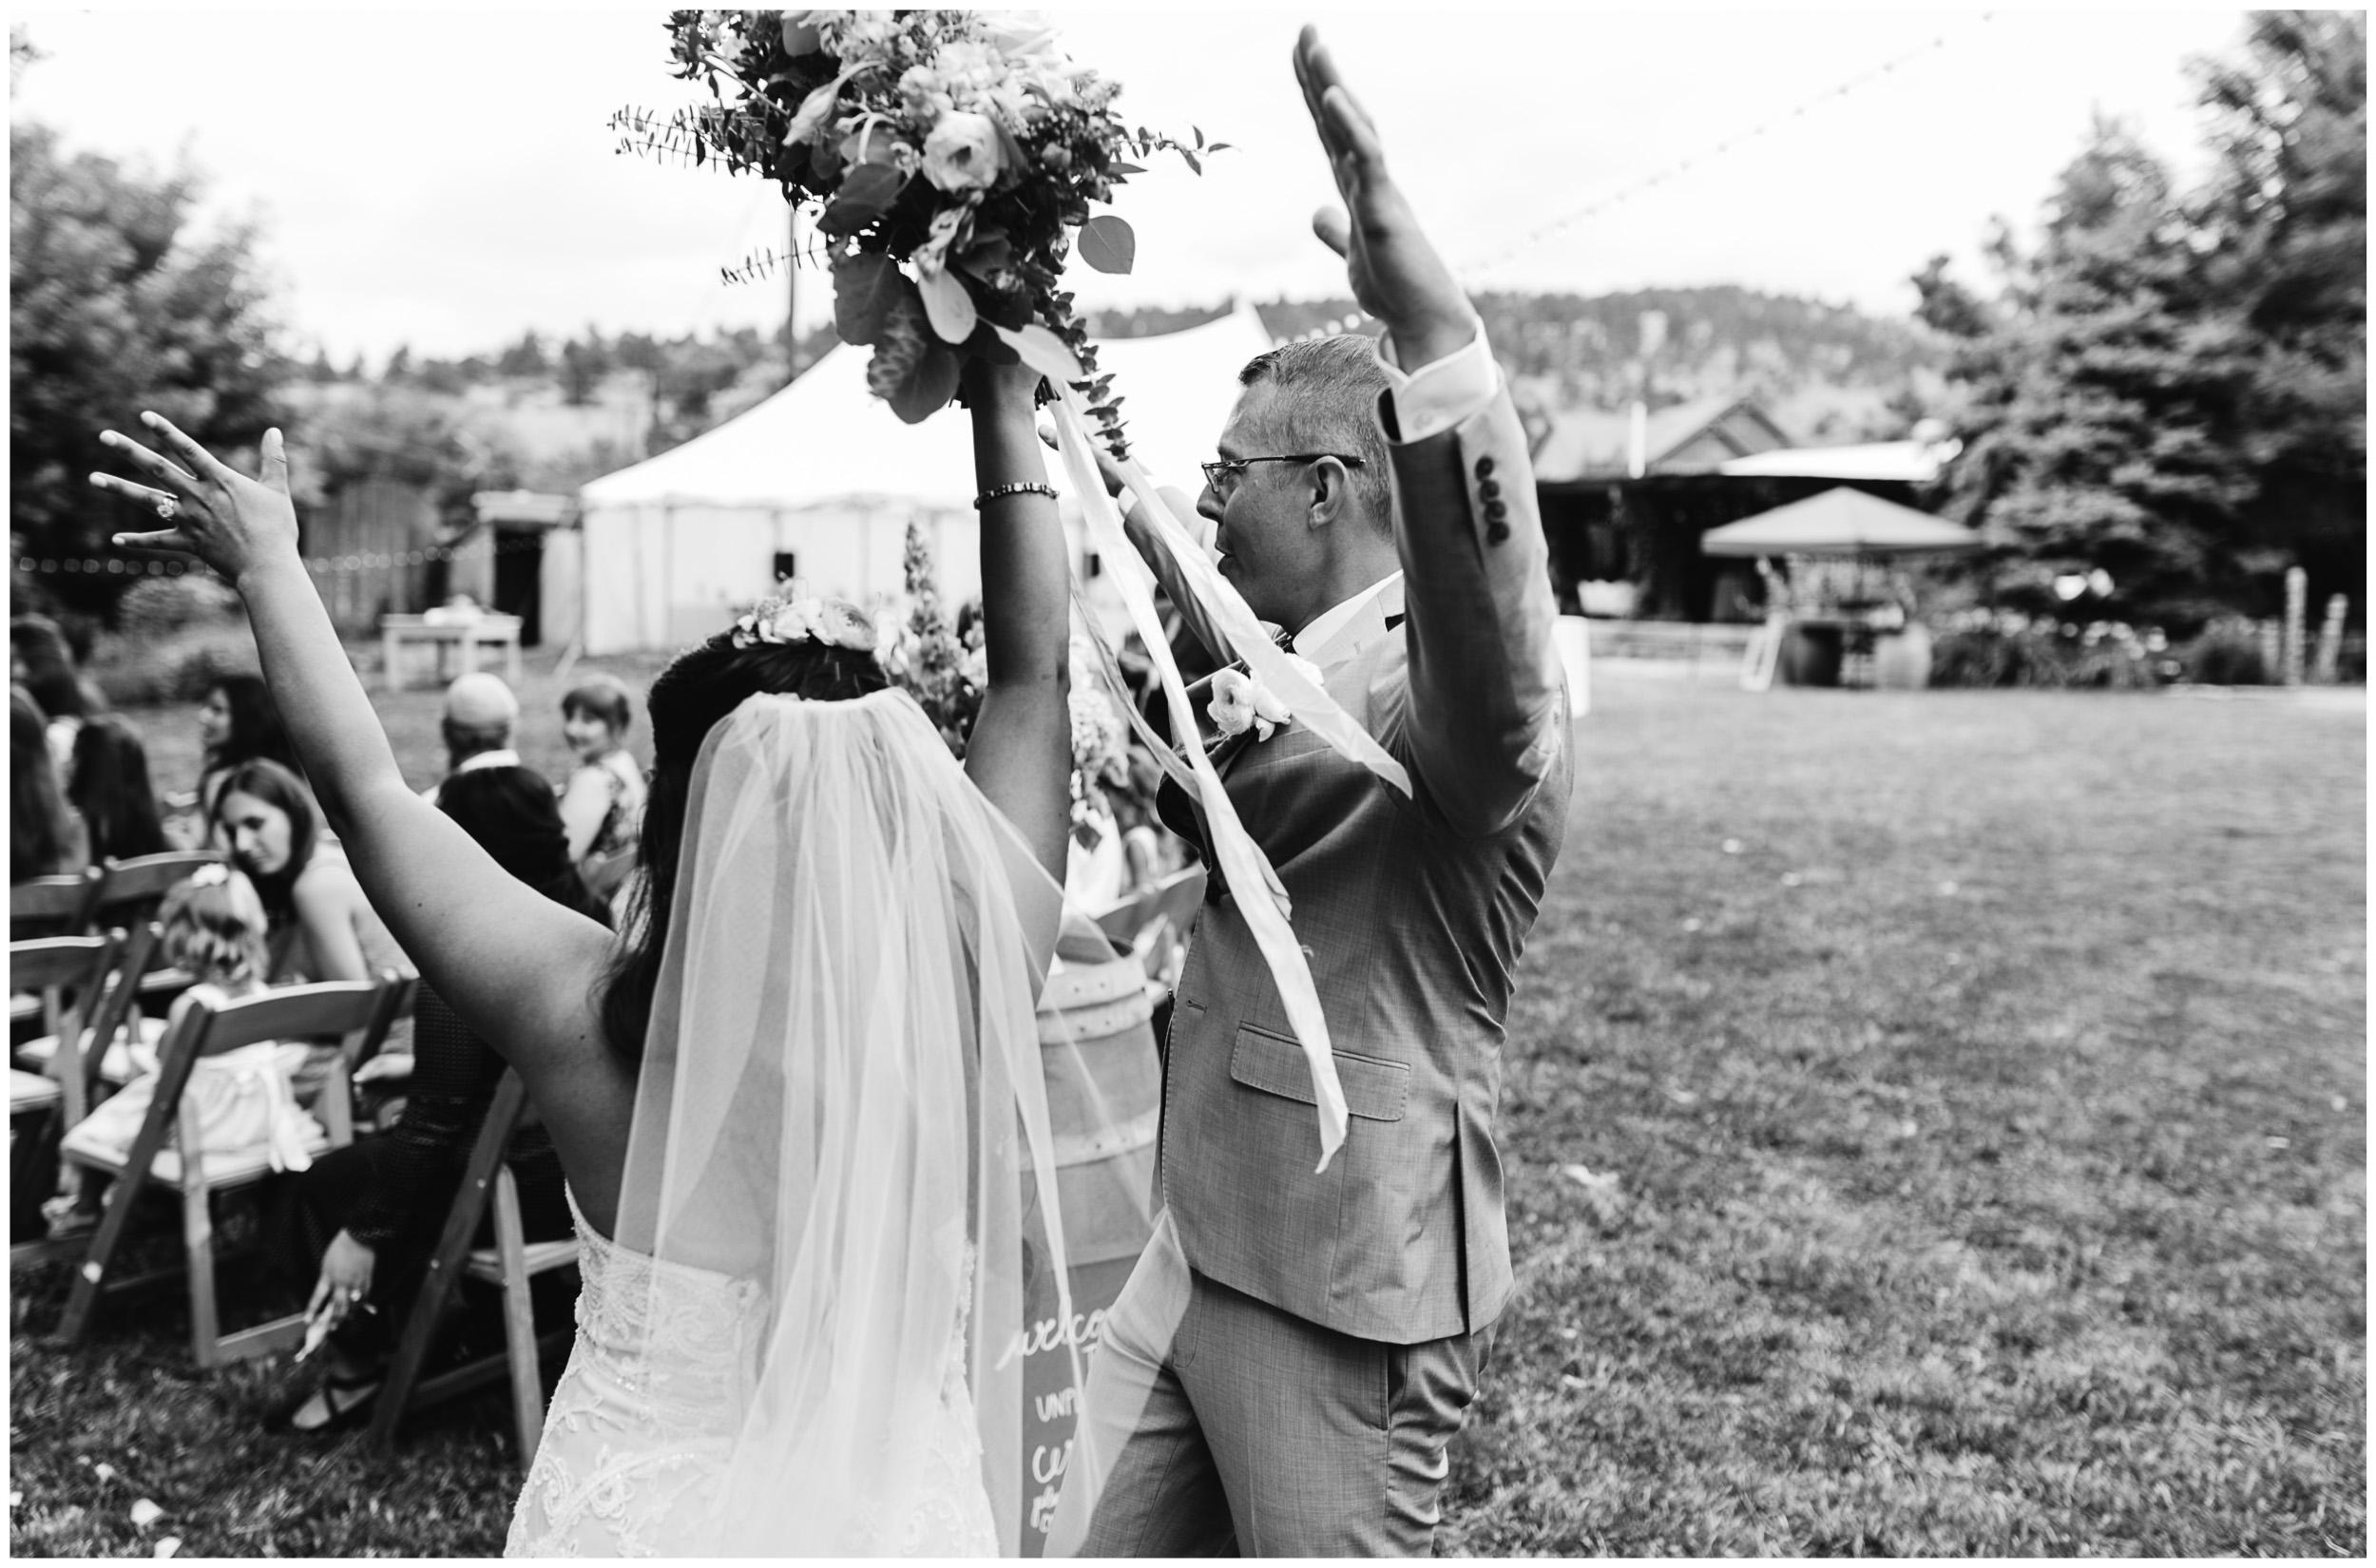 lyons_farmette_wedding_29.jpg